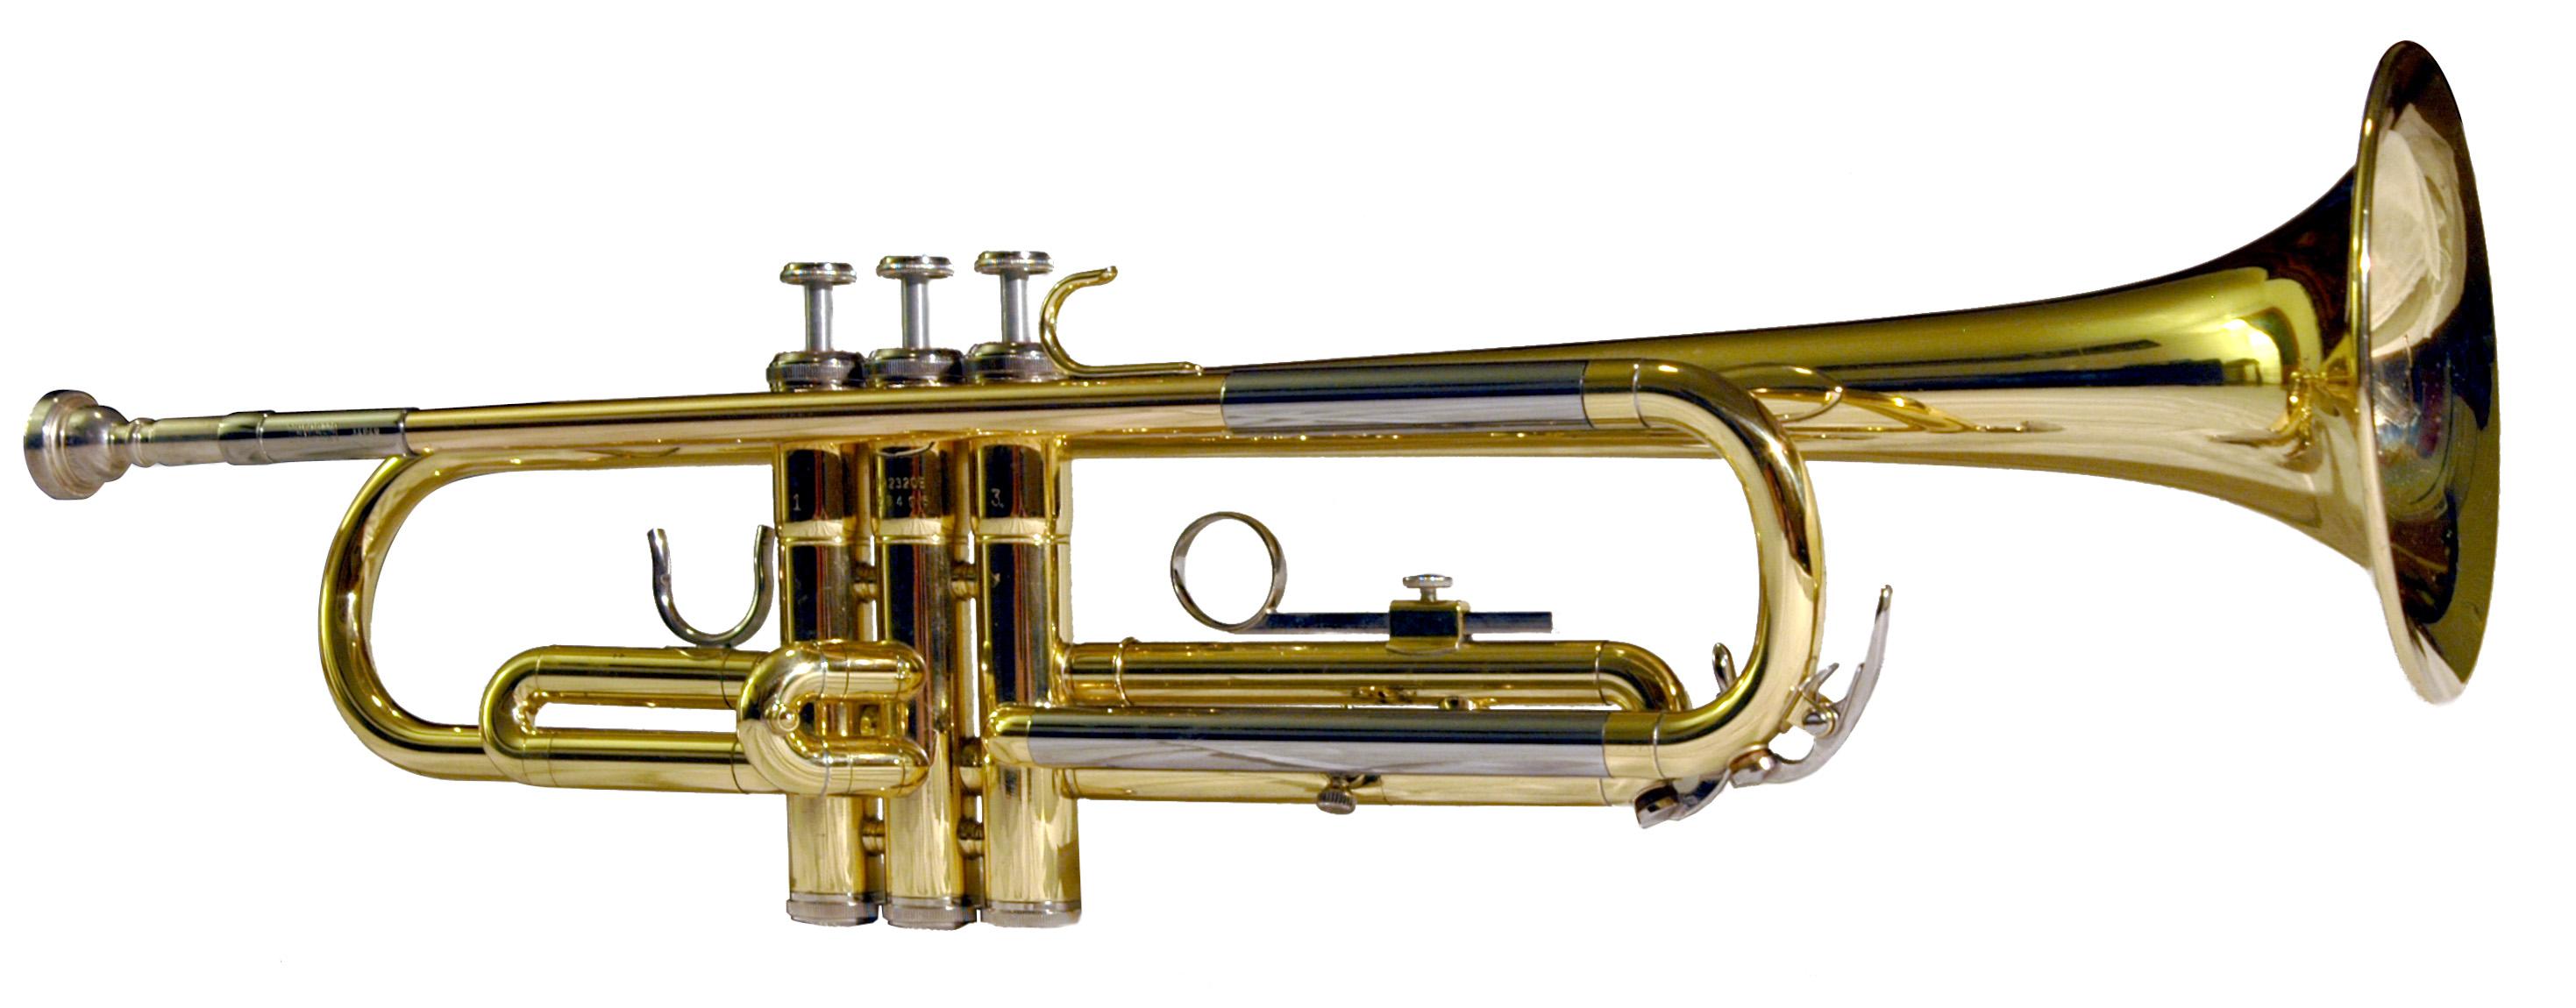 History Of Yamaha Trumpets